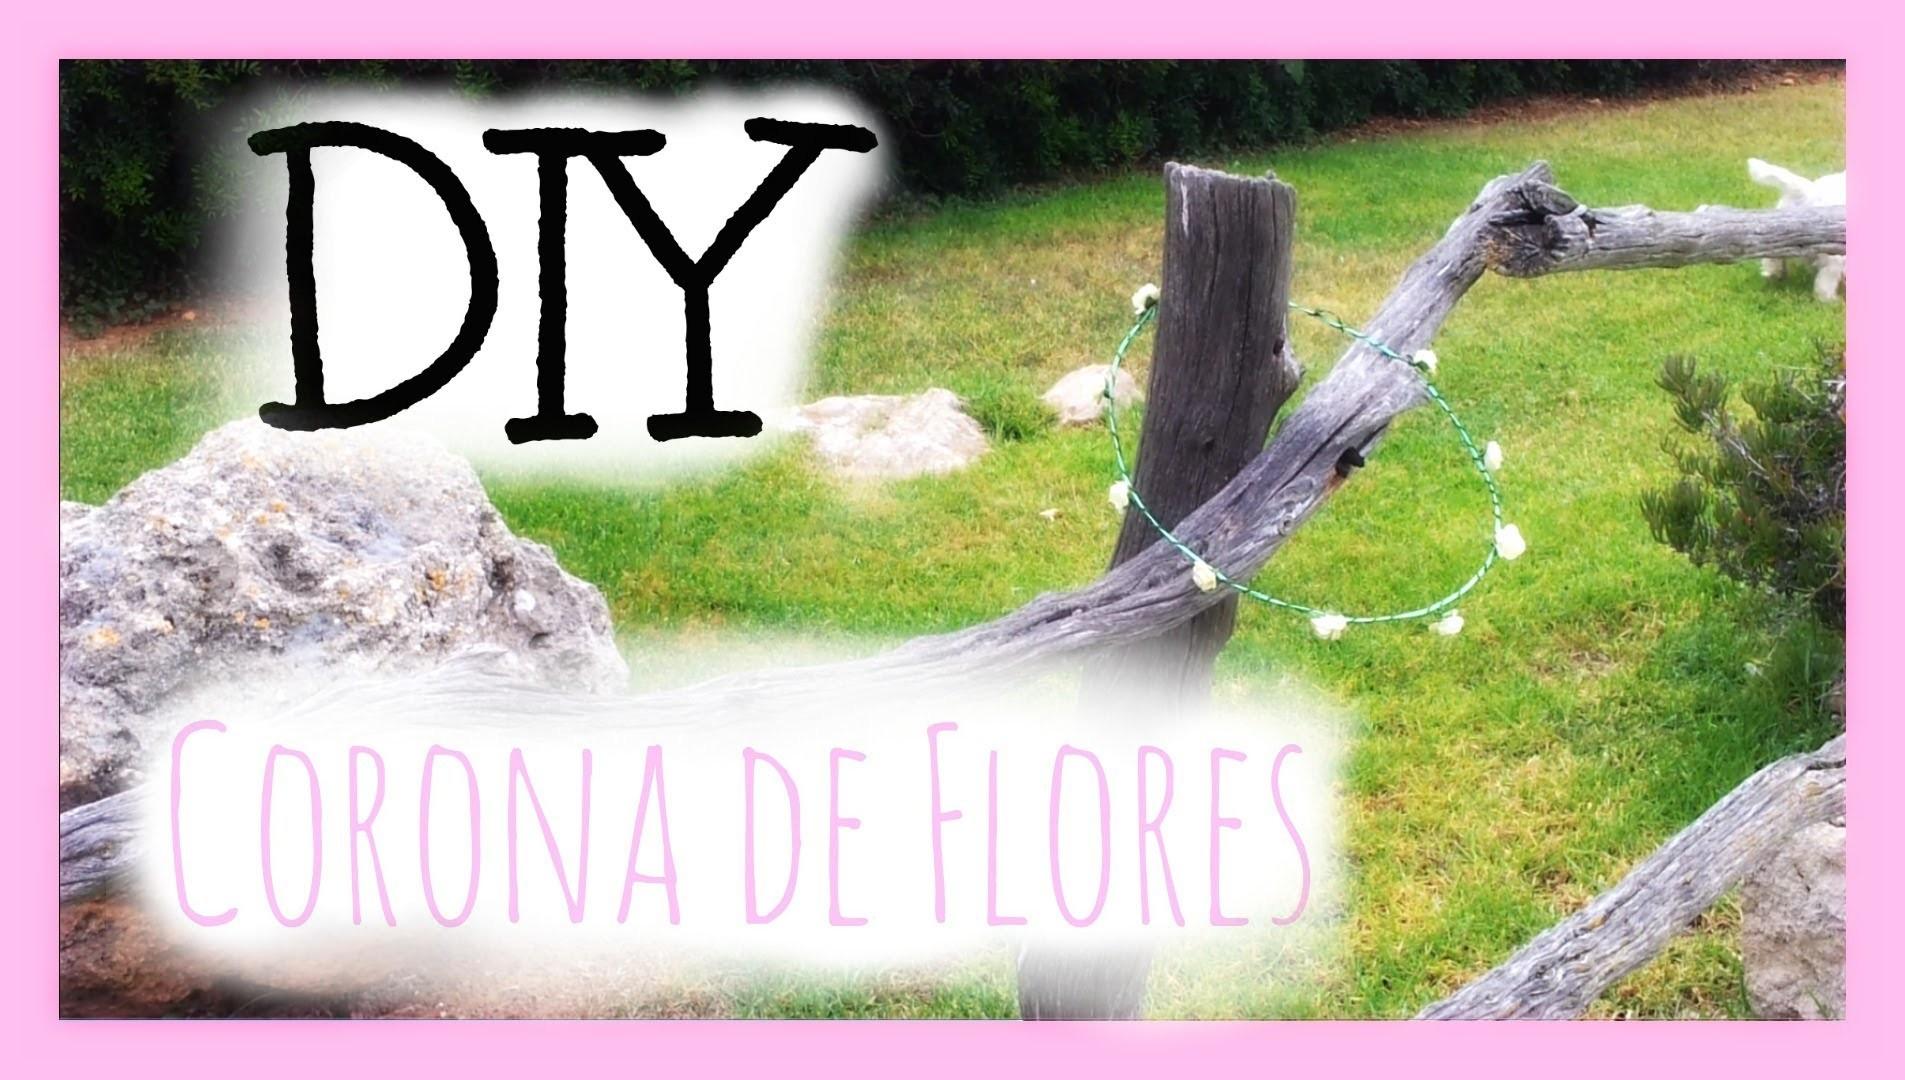 DIY: Corona de flores || Flower crown